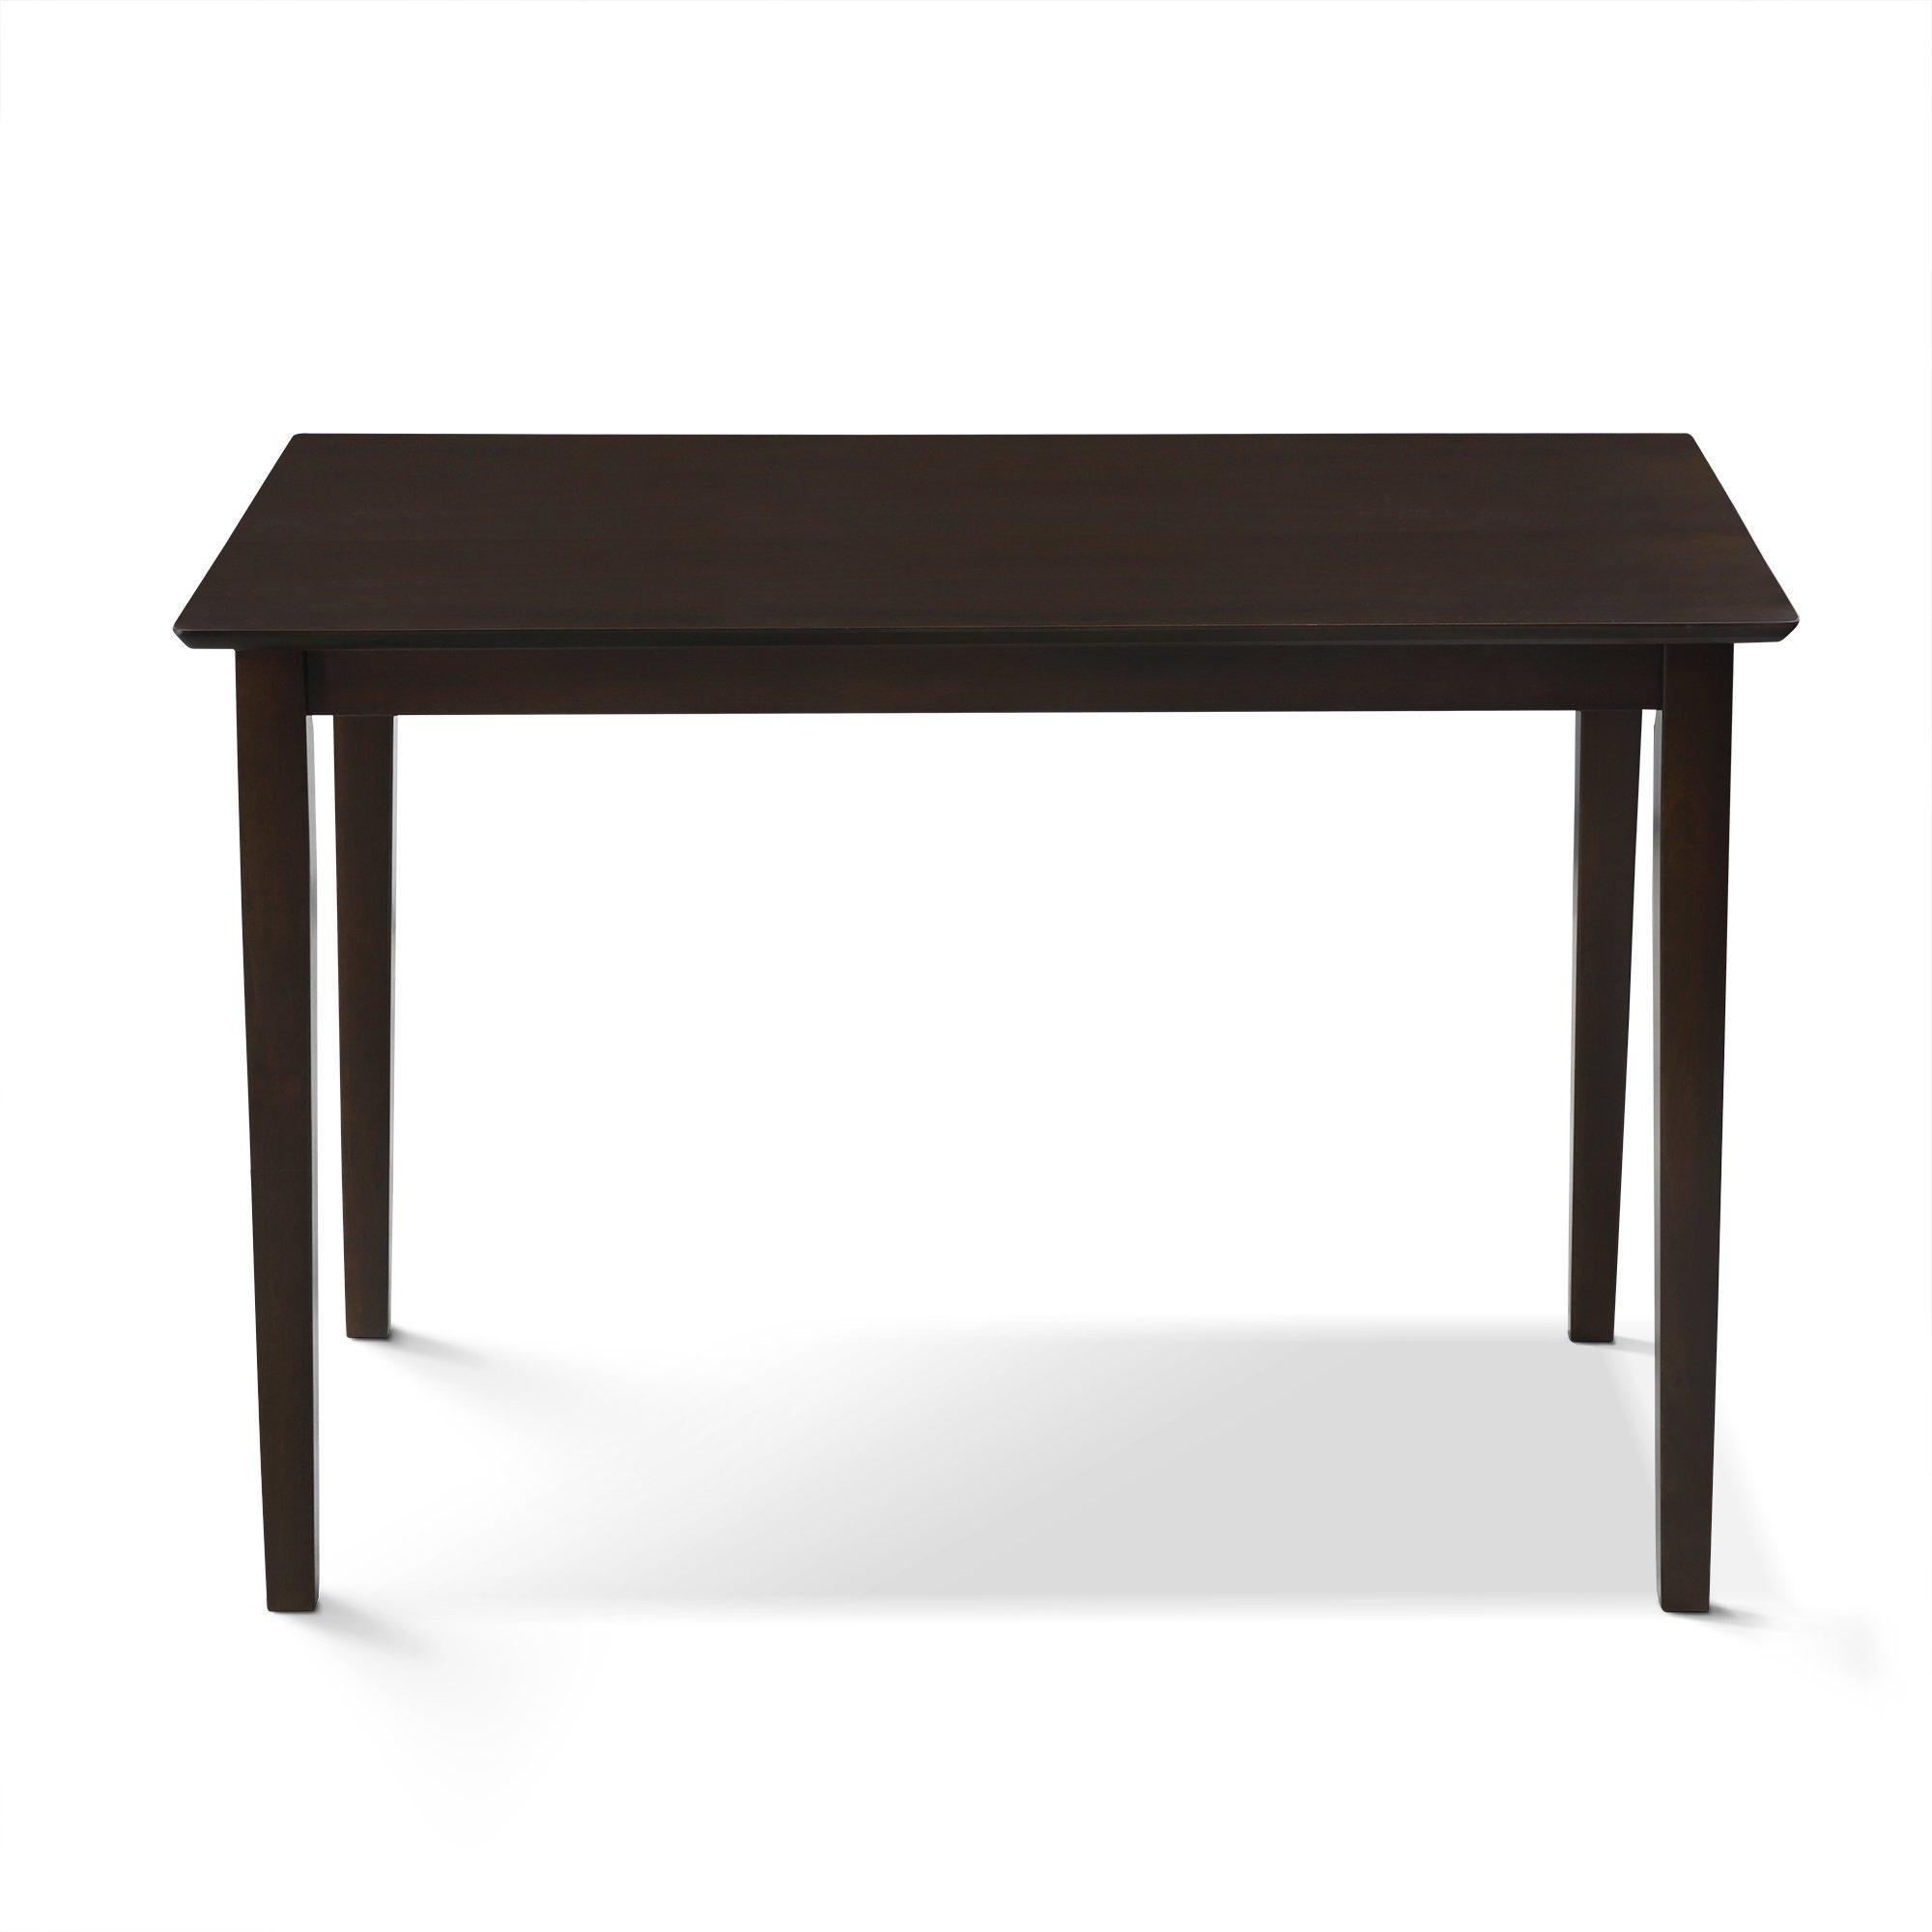 FURINNO Fkdl006-T1 Dining Table, Espresso by Furinno